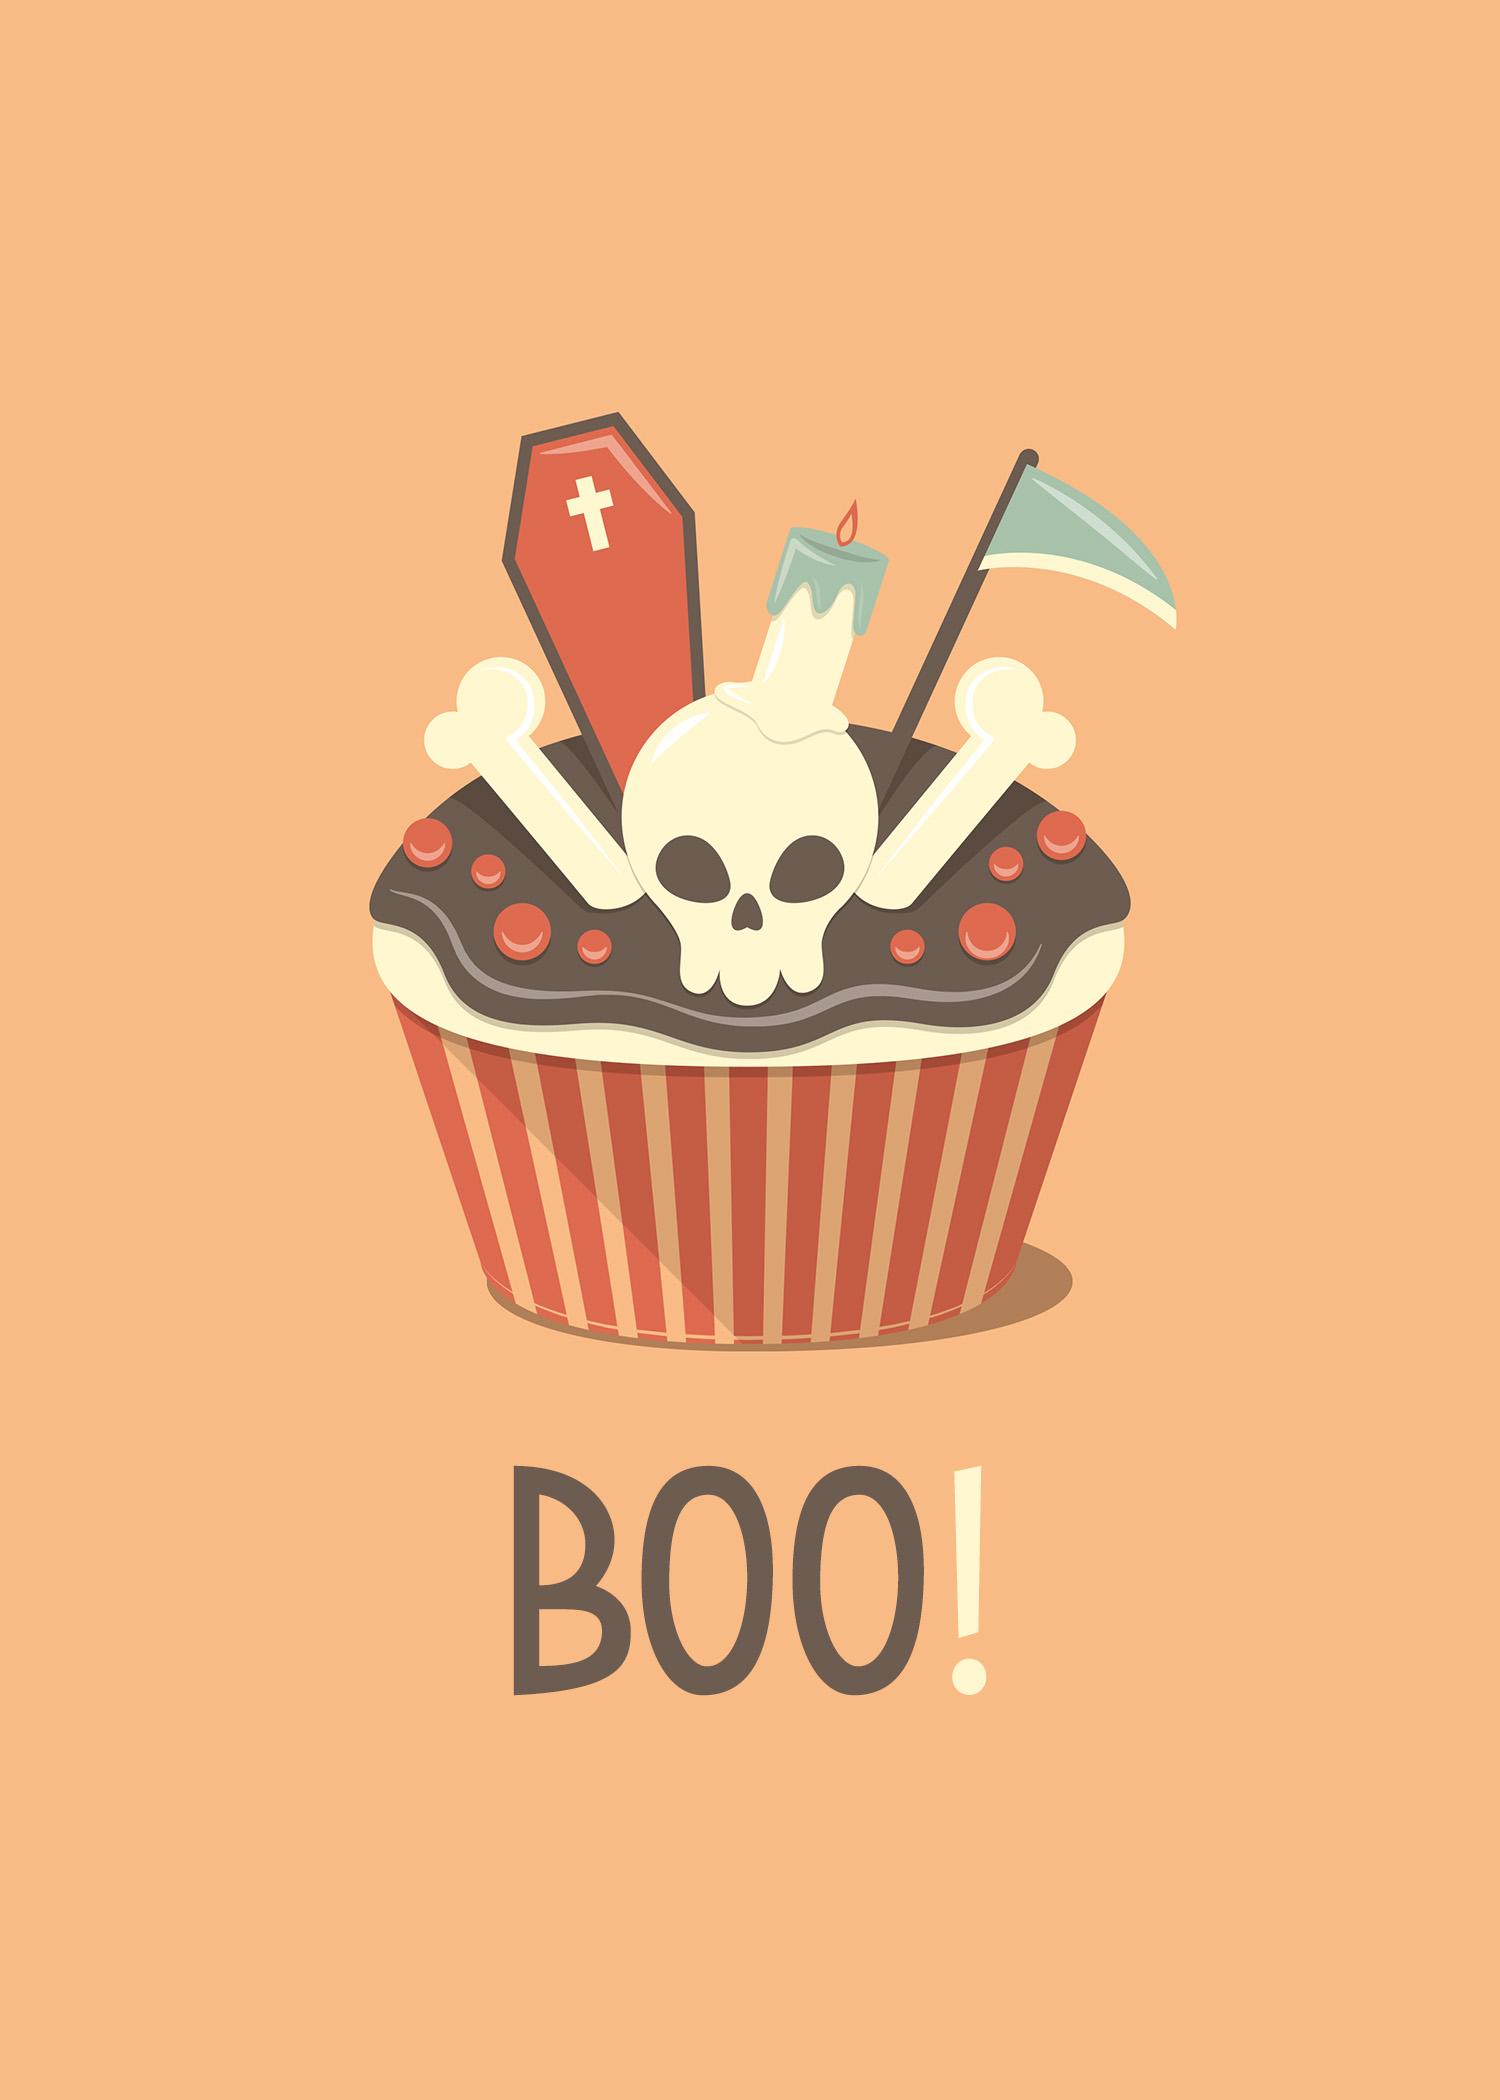 TCM-Halloween-Cupcake-5x7-2